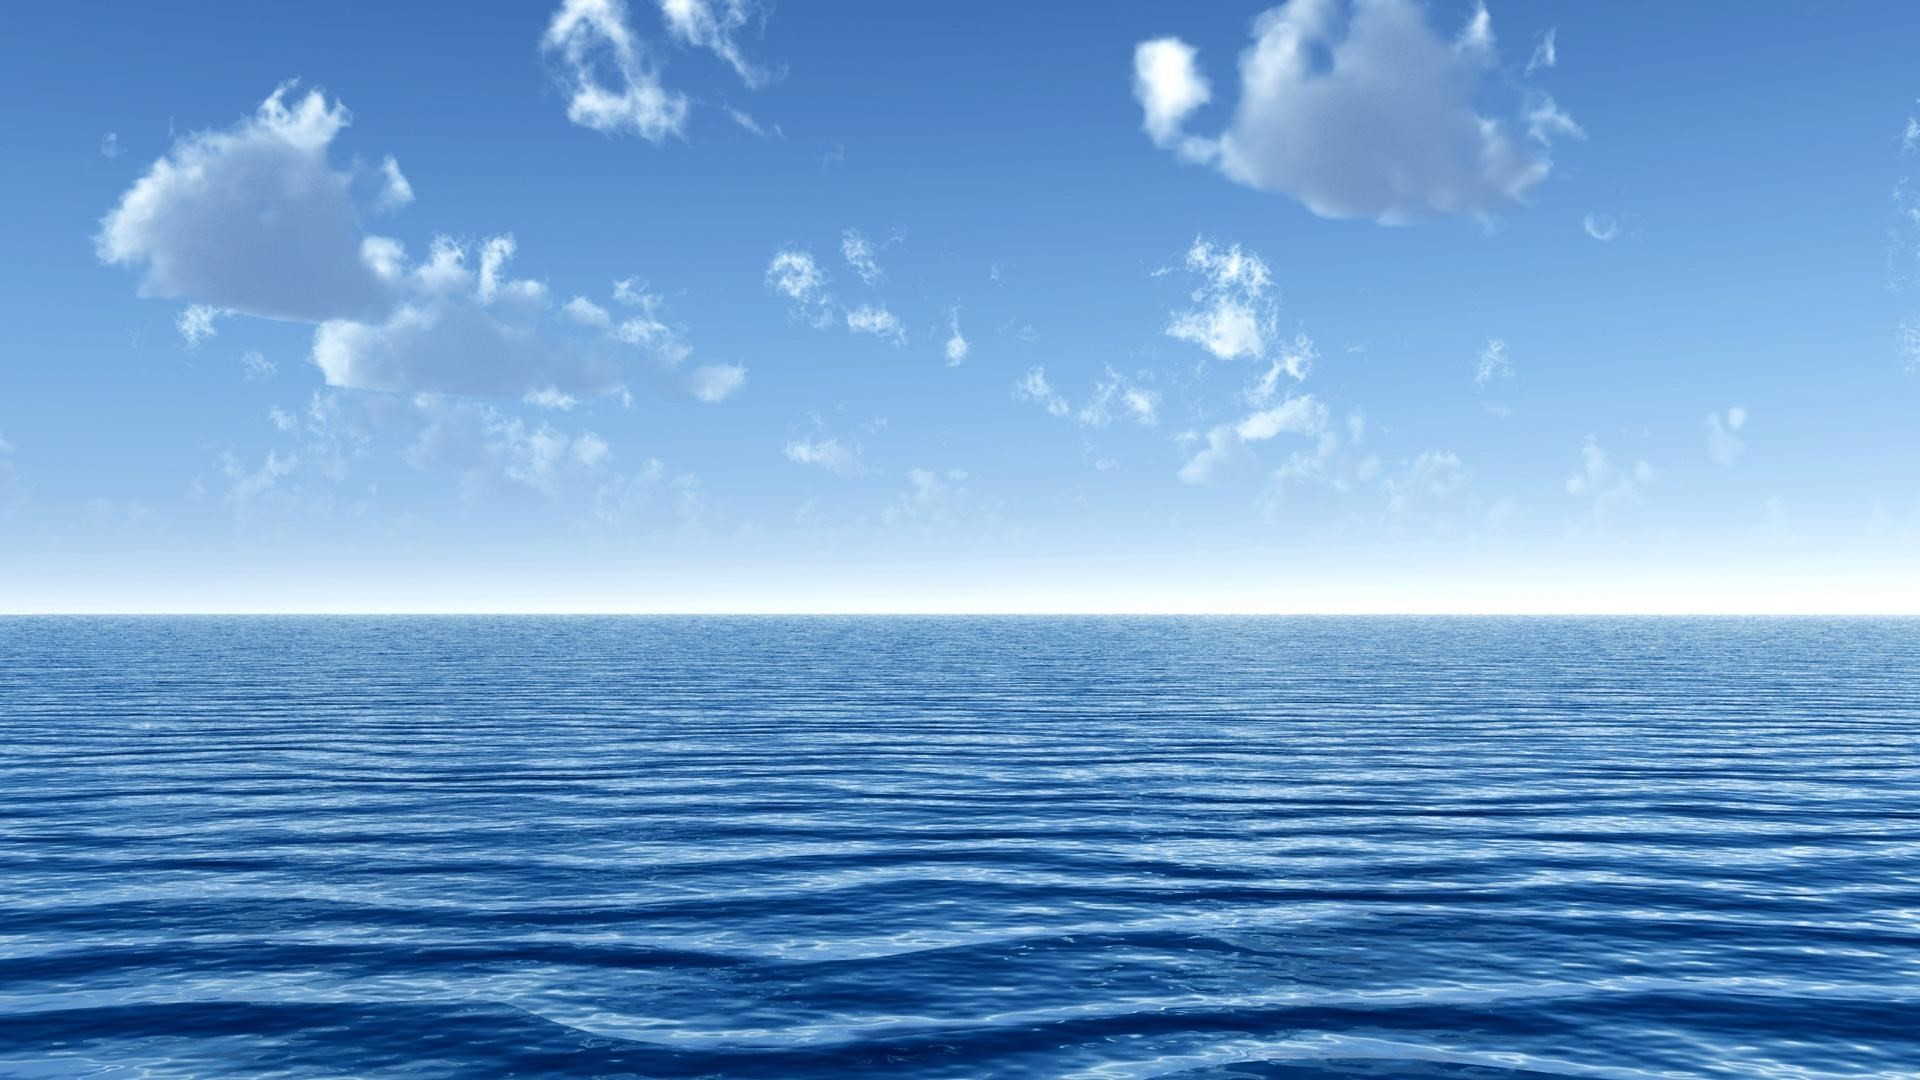 ocean images background